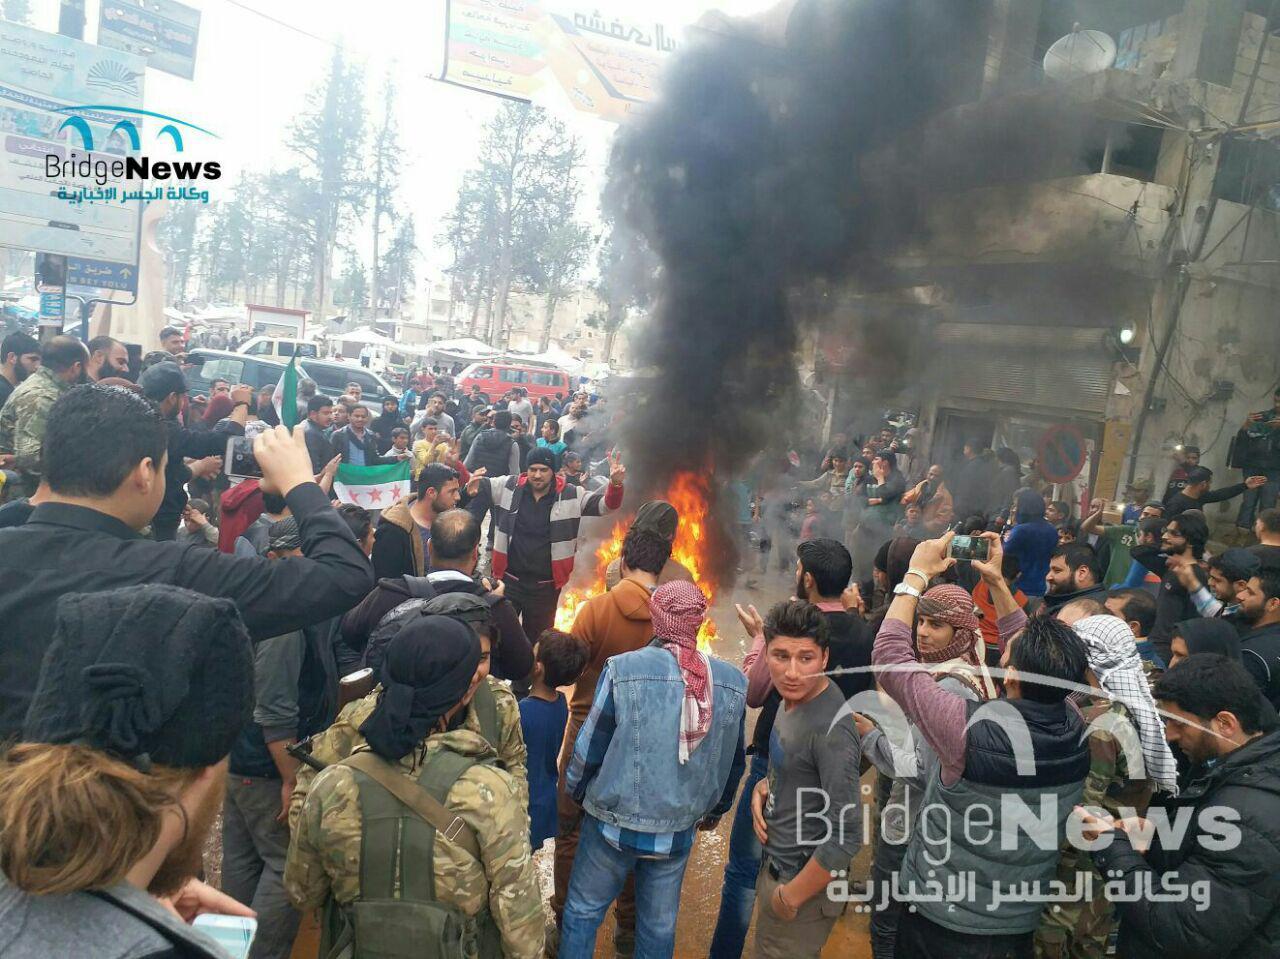 Turkey Hinders Evacuation Of Jaysh al-Islam Fighters, Russia Prepares To Deploy Troops In Duma